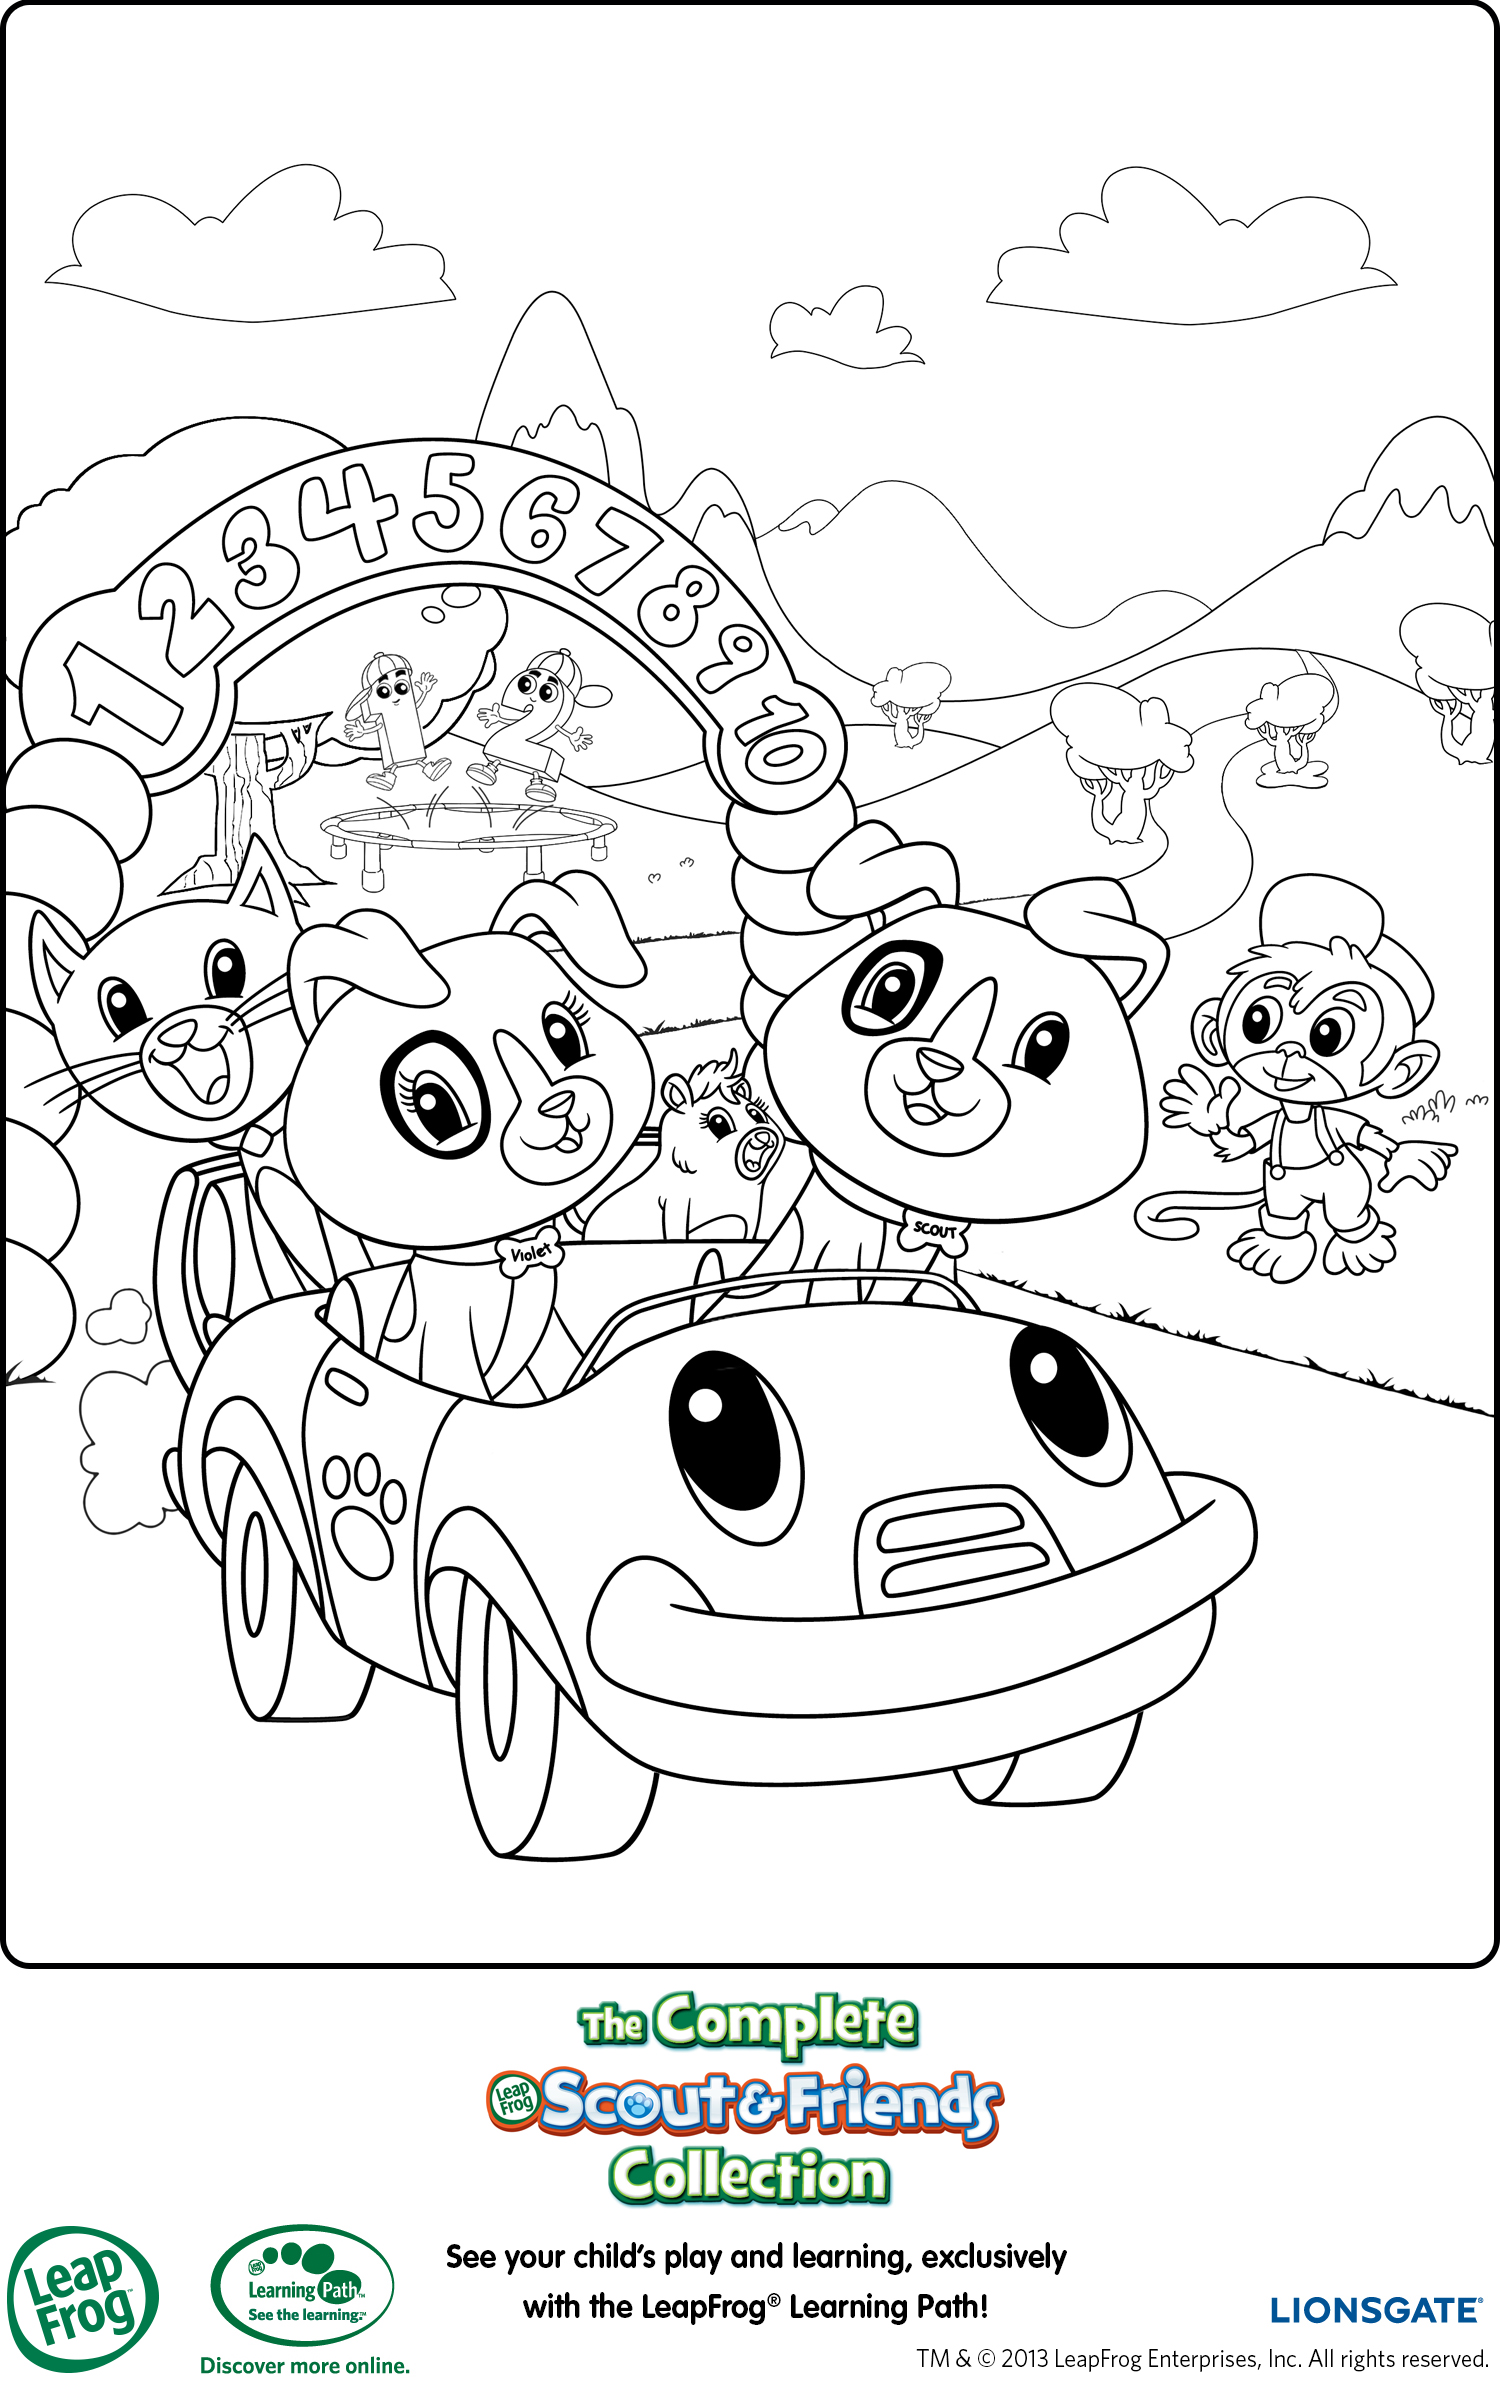 leapfrog printable coloring page mama likes this